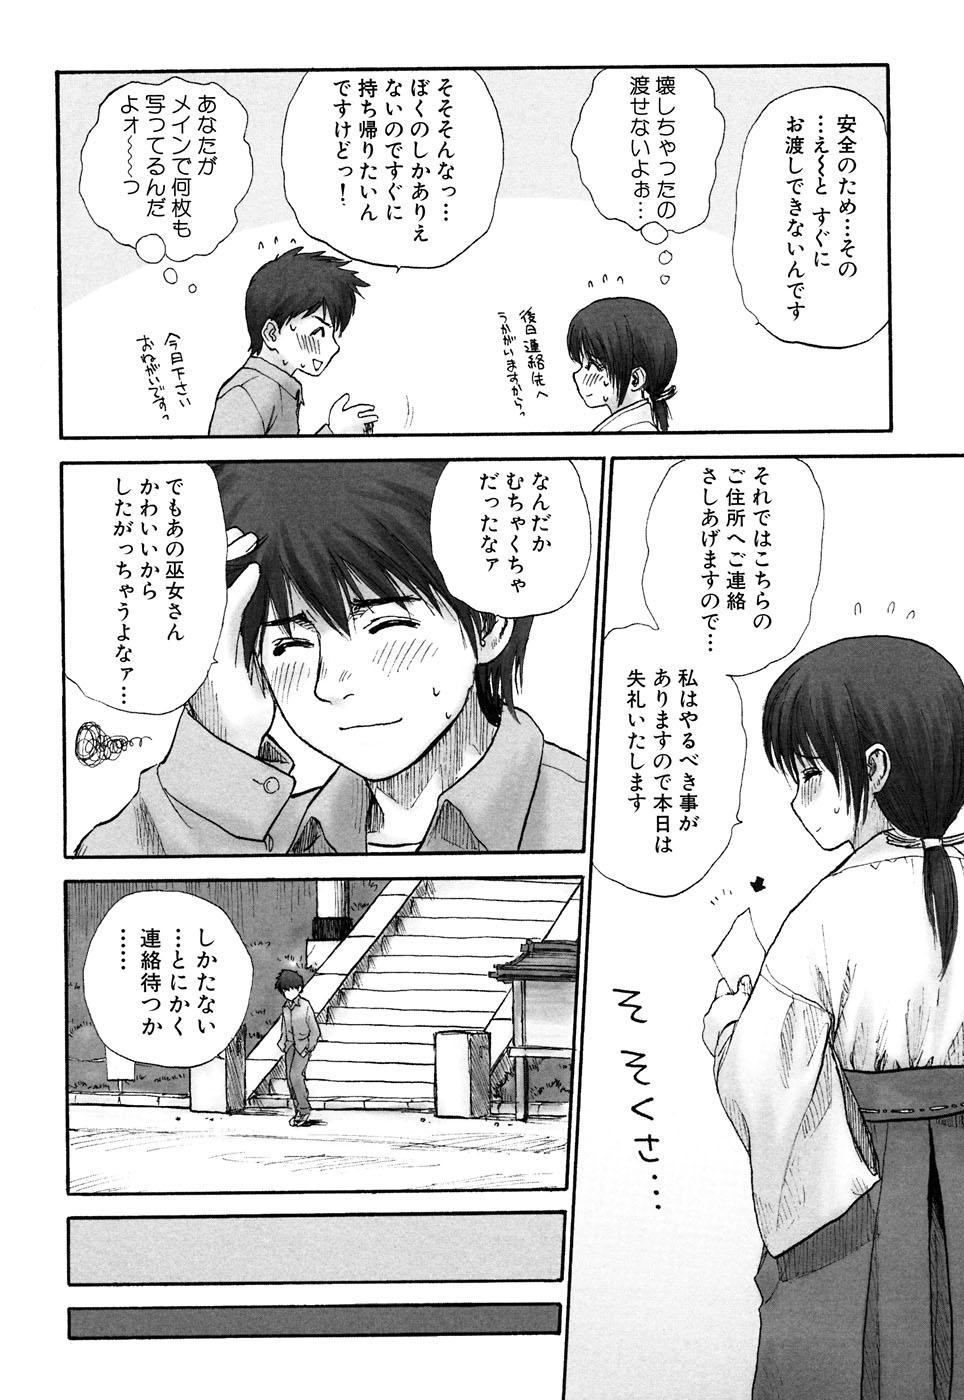 Fechikko VS Series ROUND.2 Miko San VS Maid San 72